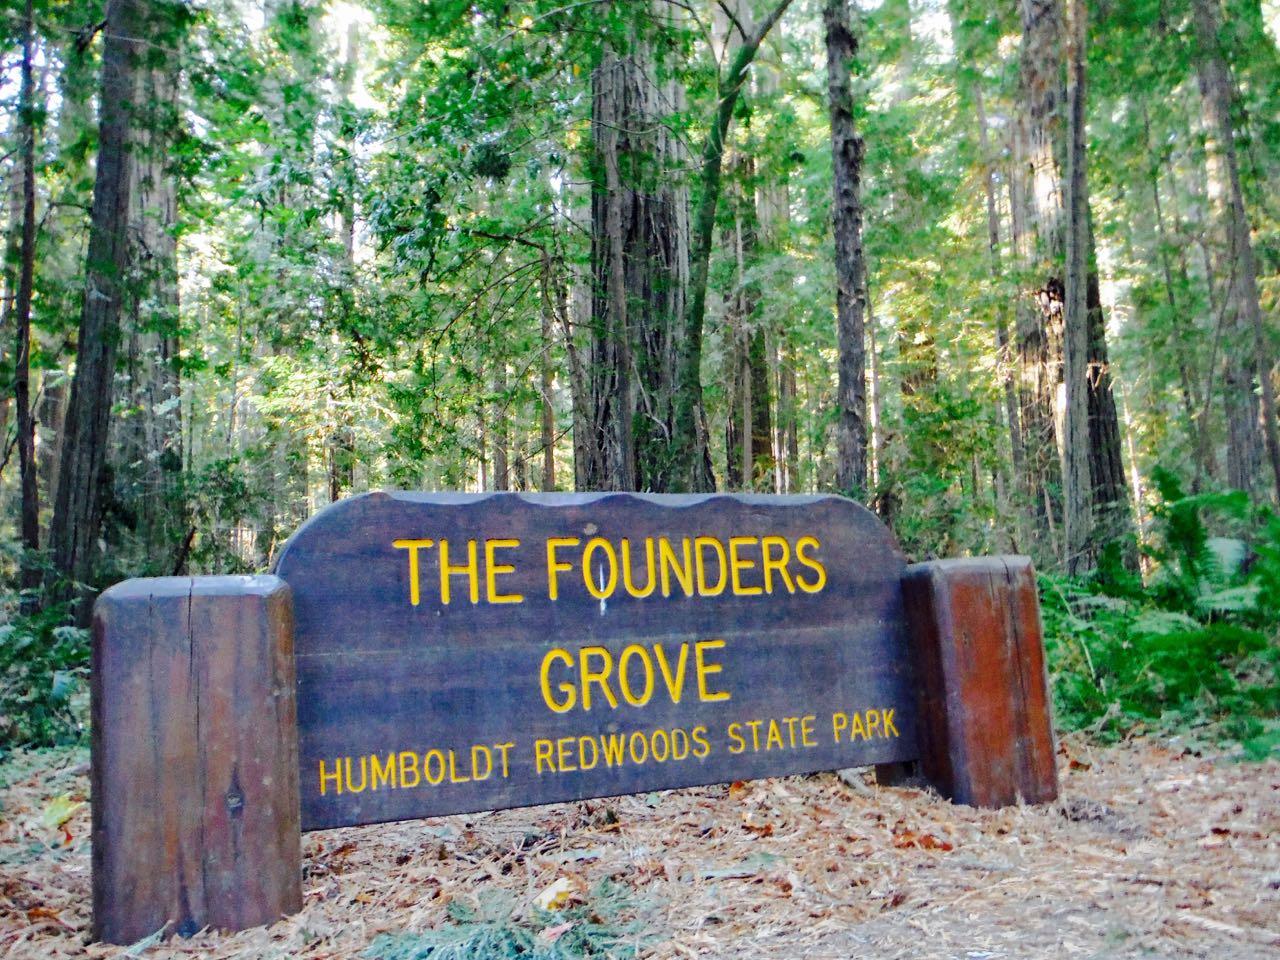 Redwoods 2017 10 08 2 Of 287